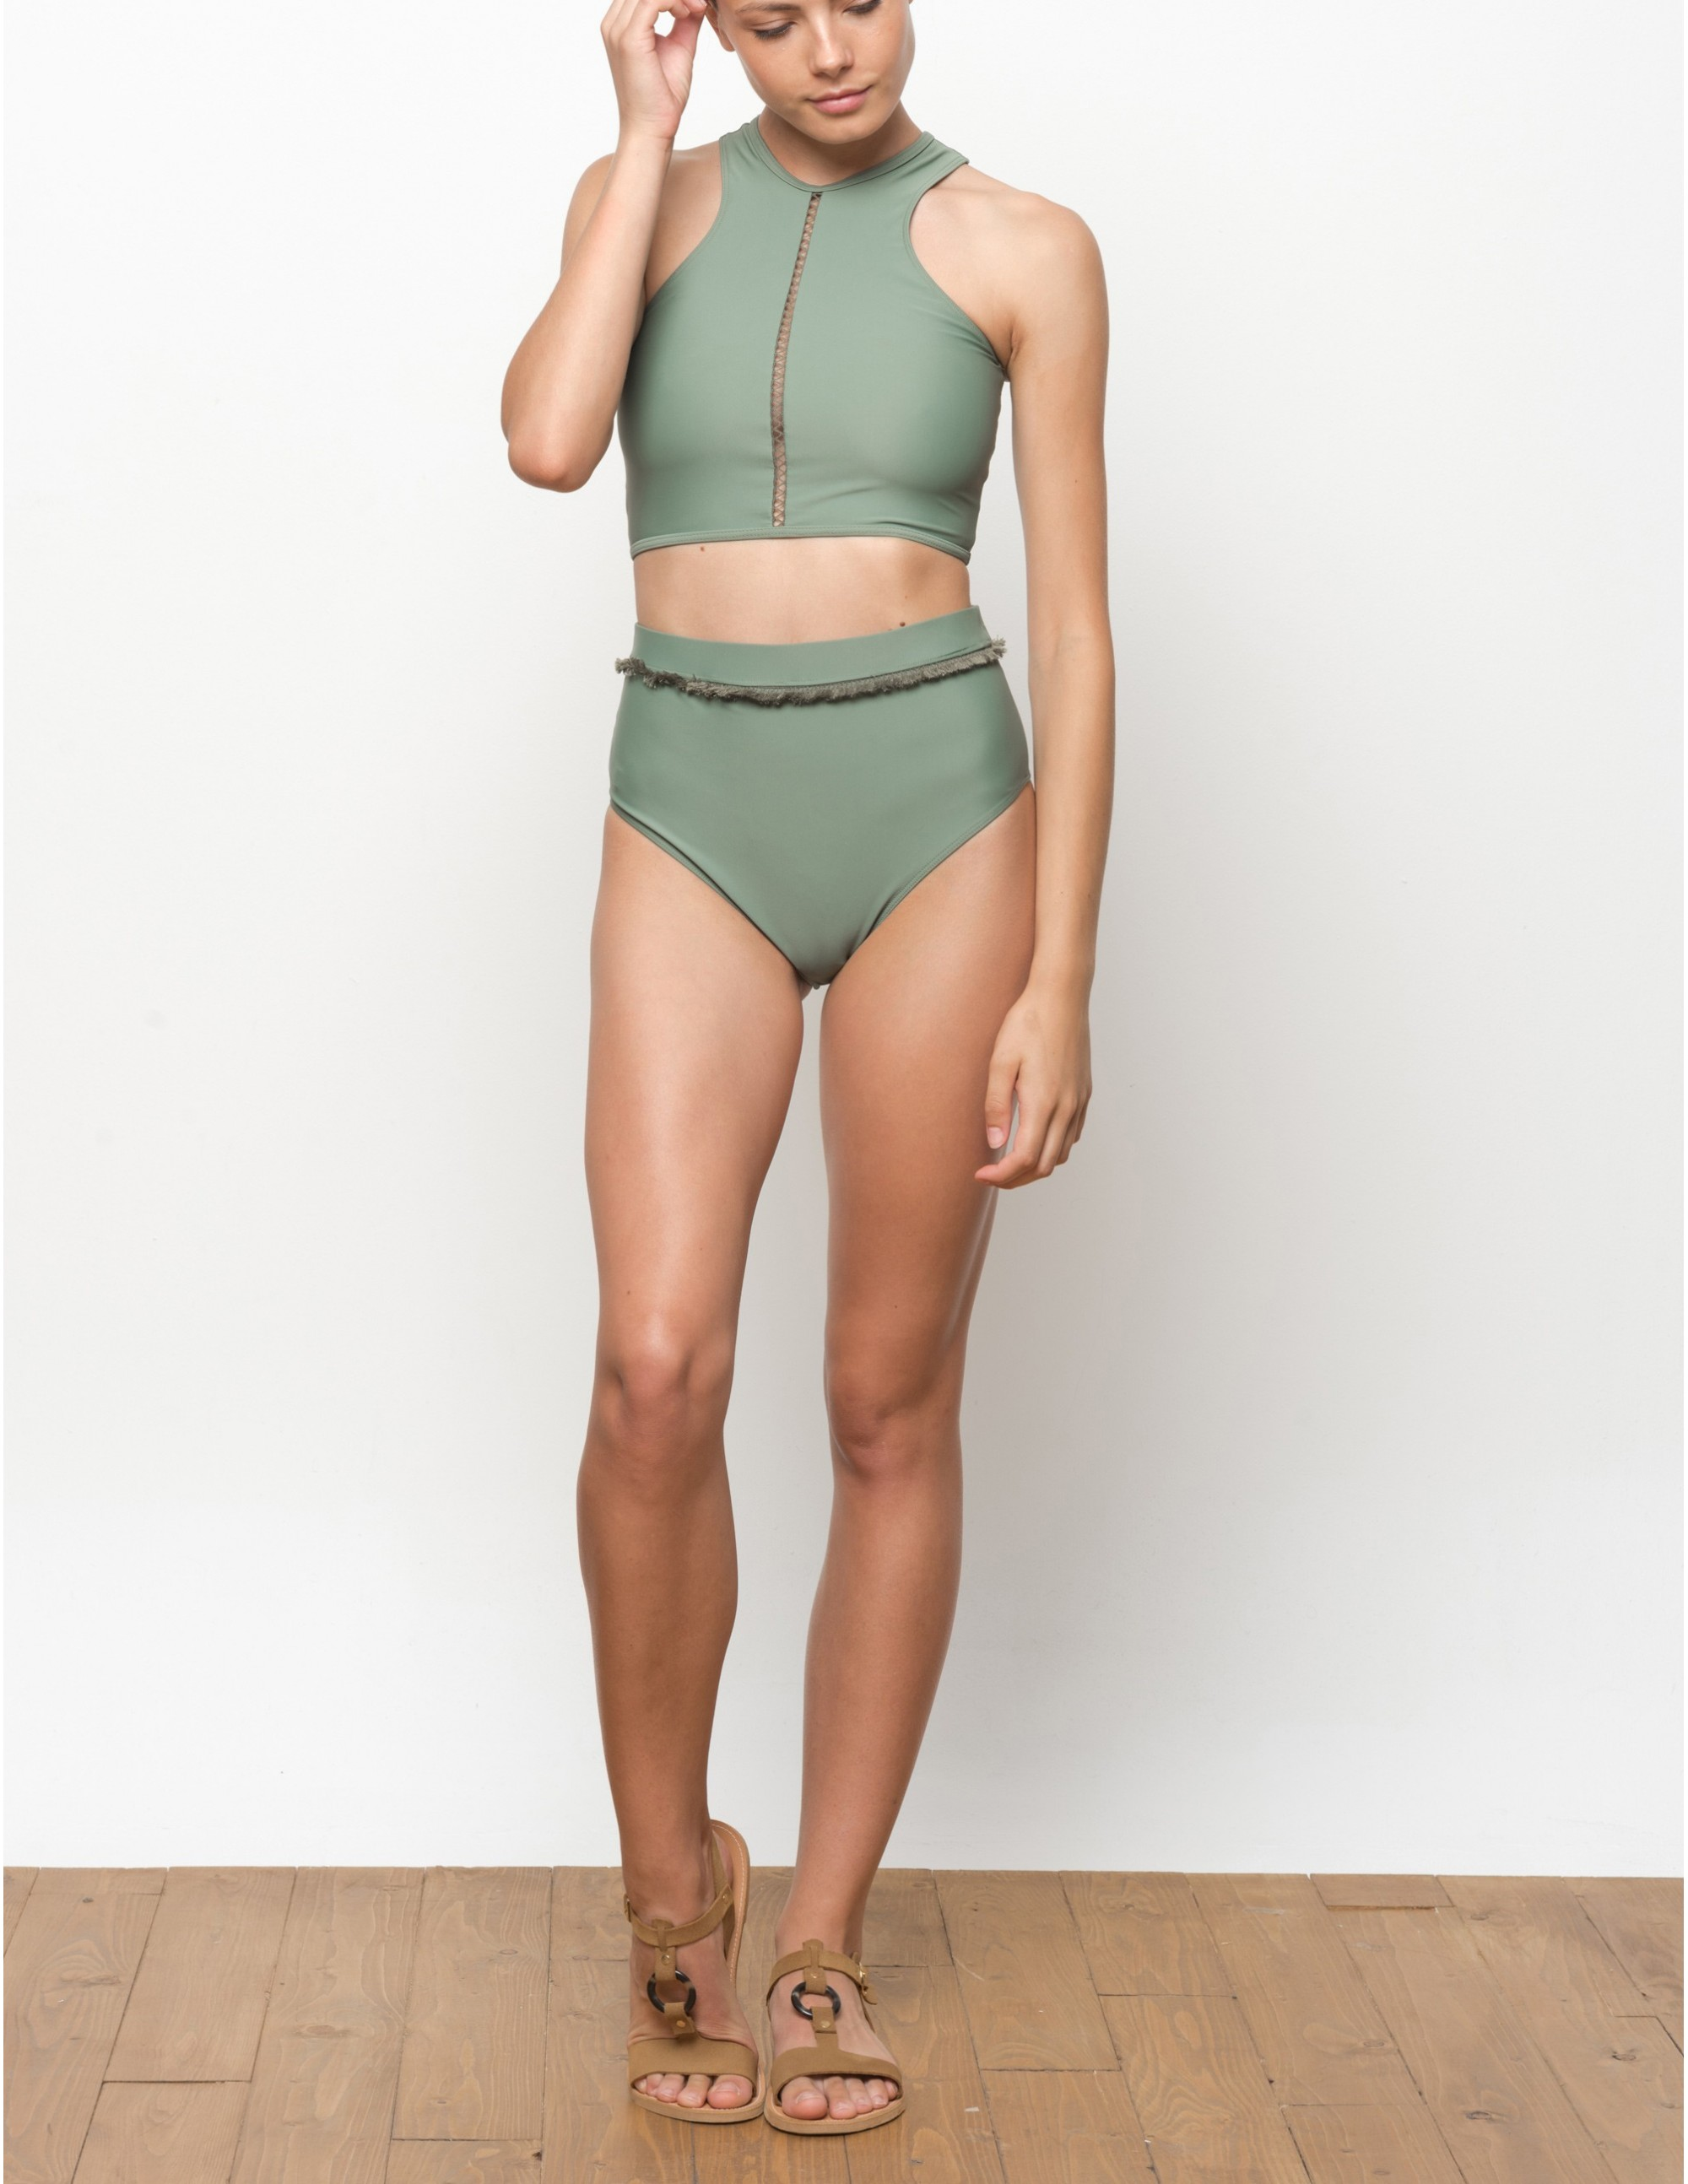 NAKU bikini top - SERENGETI